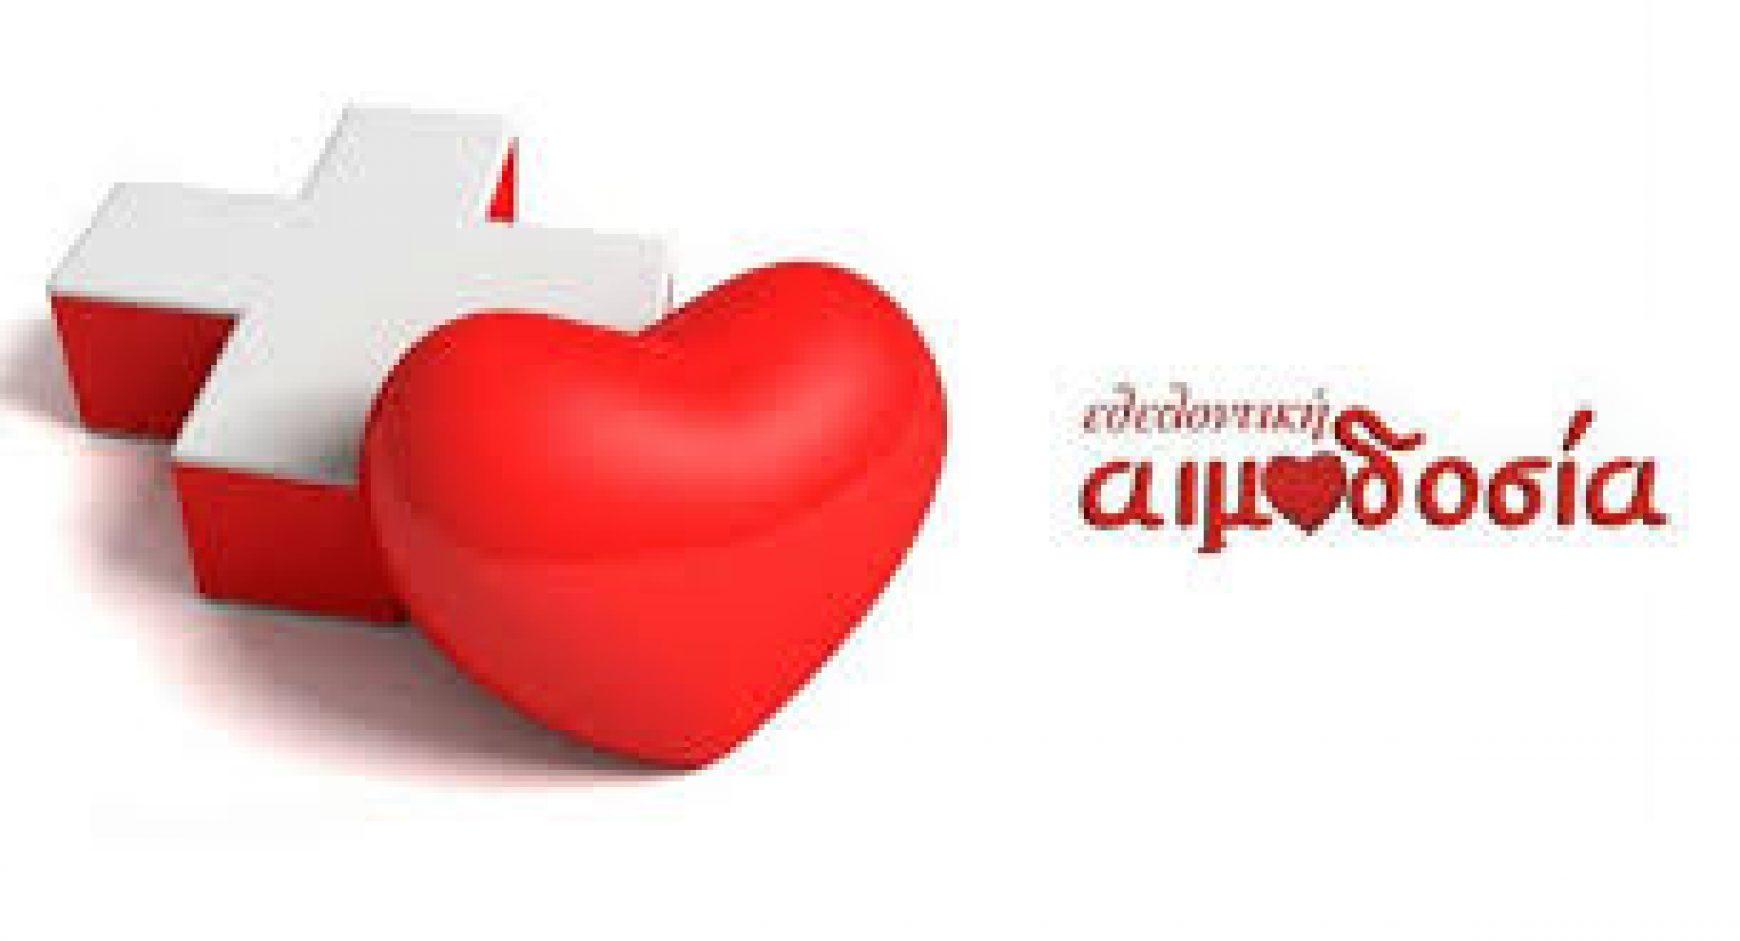 Eθελοντική Αιμοδοσία